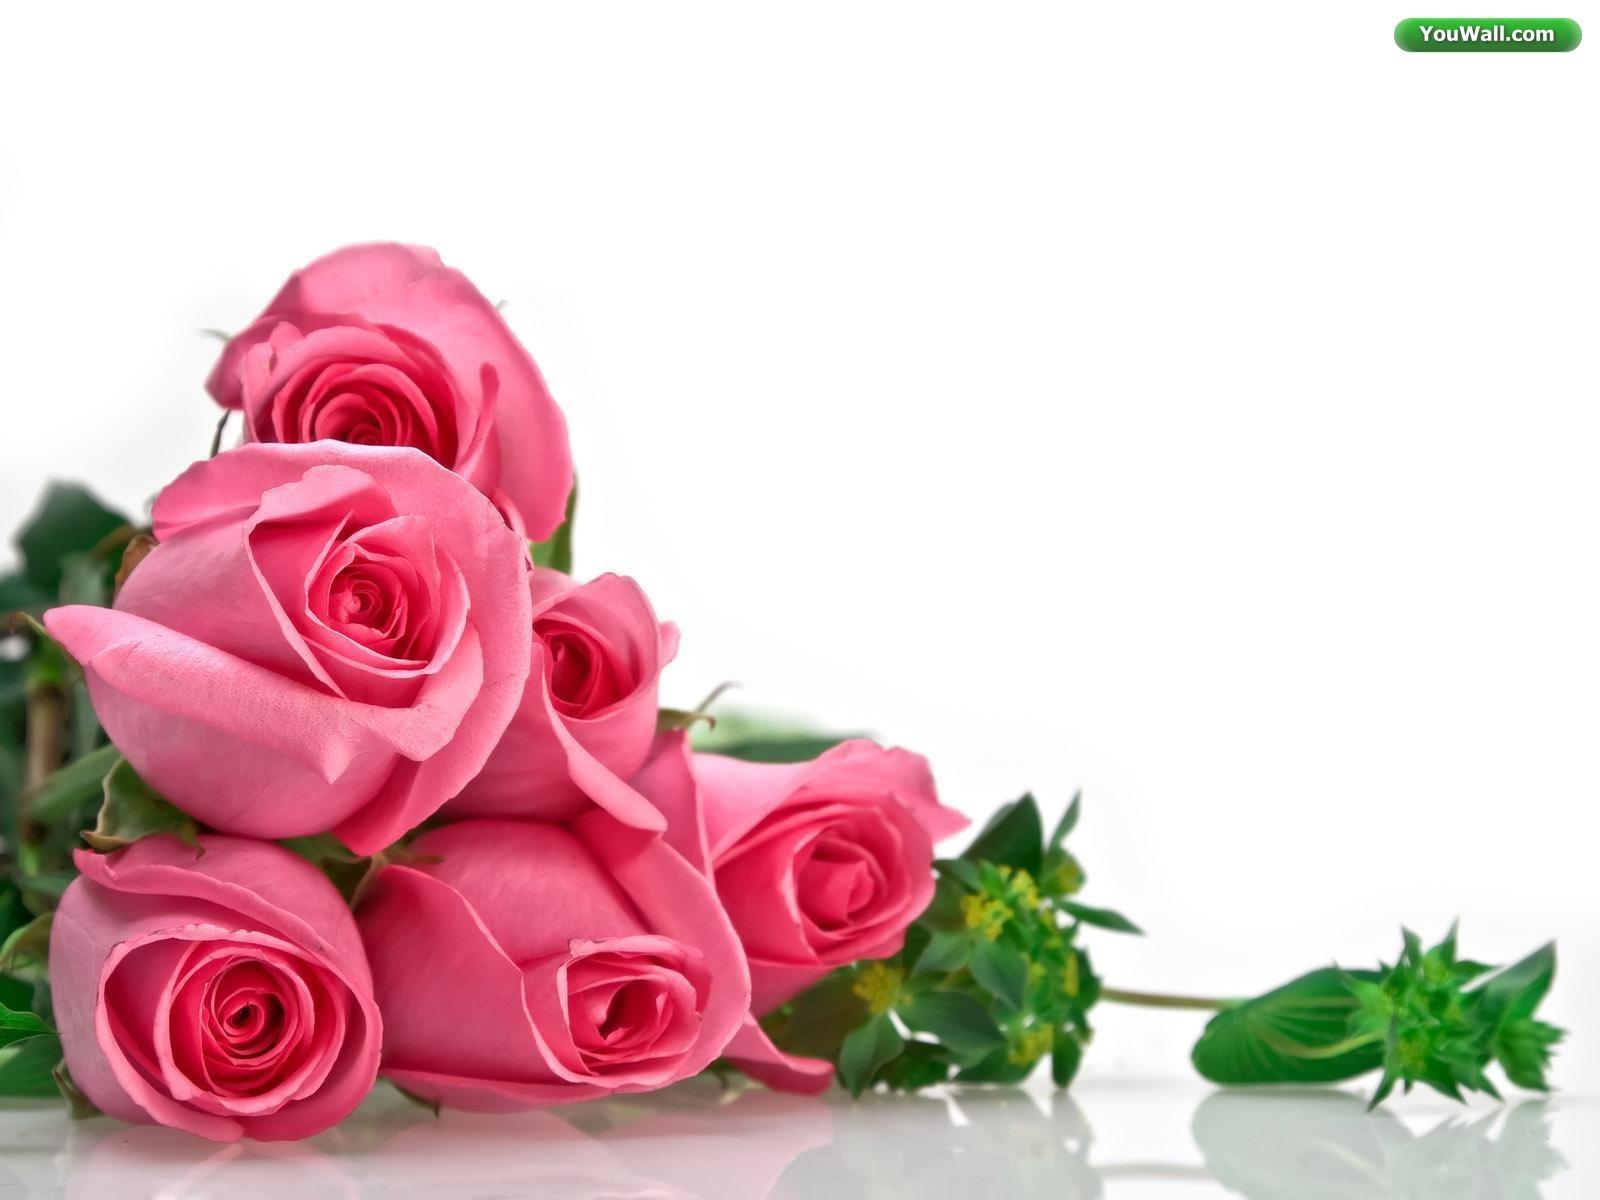 roses wallpaper desktop See To World